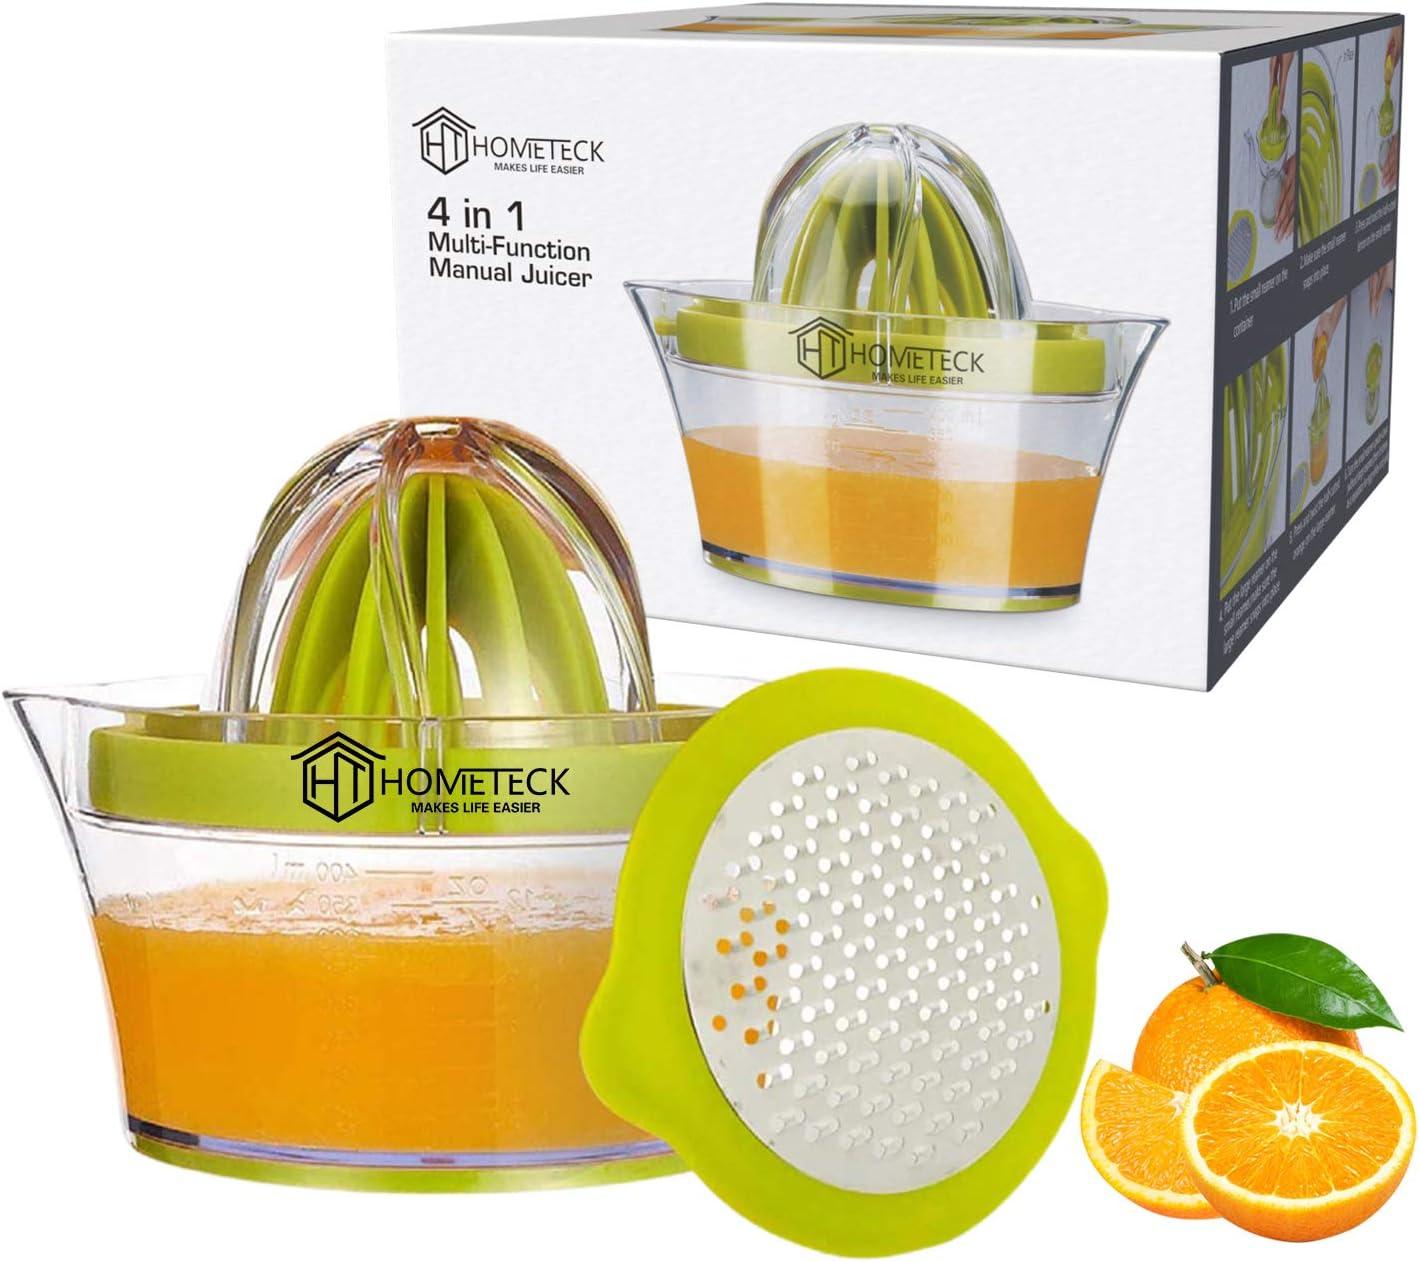 HomeTeck® Lemon Manual Juicer, 4 in 1 Lemon Orange Citrus Juicer Built-in Measuring Cup and Grater, Manual Hand Squeezer, 12OZ.